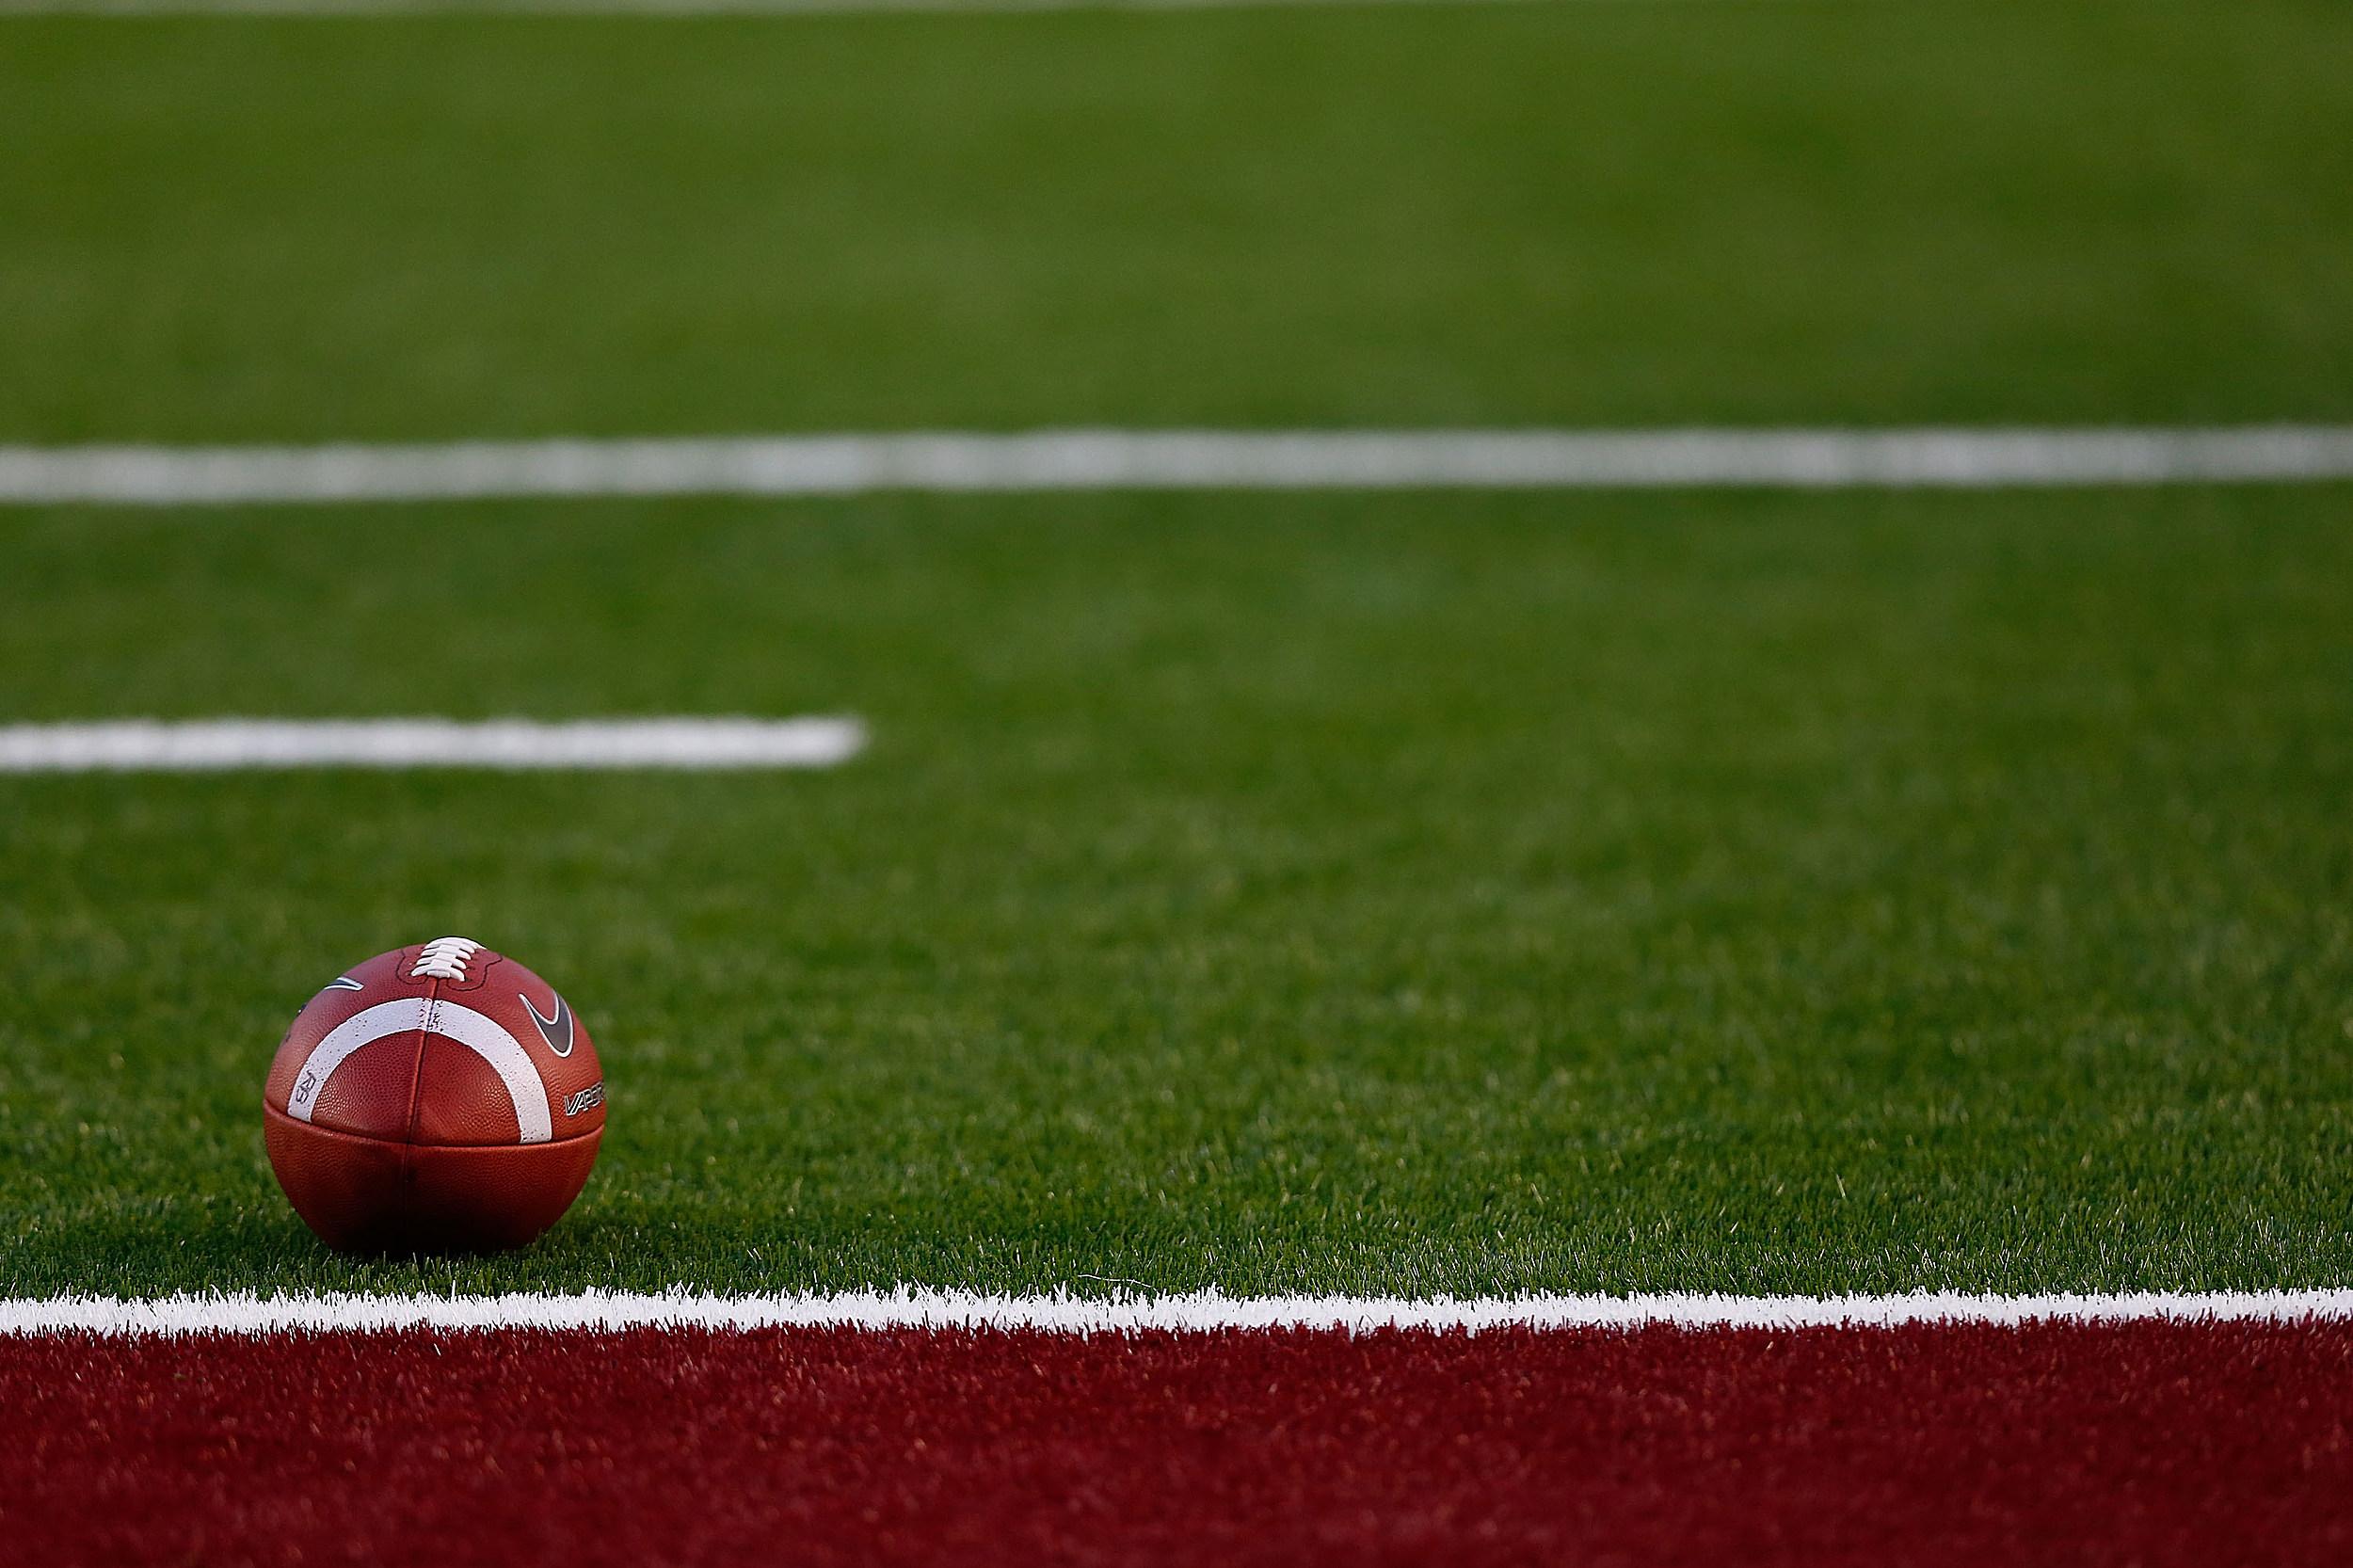 Lhsaa Football Playoff Predictions - image 7